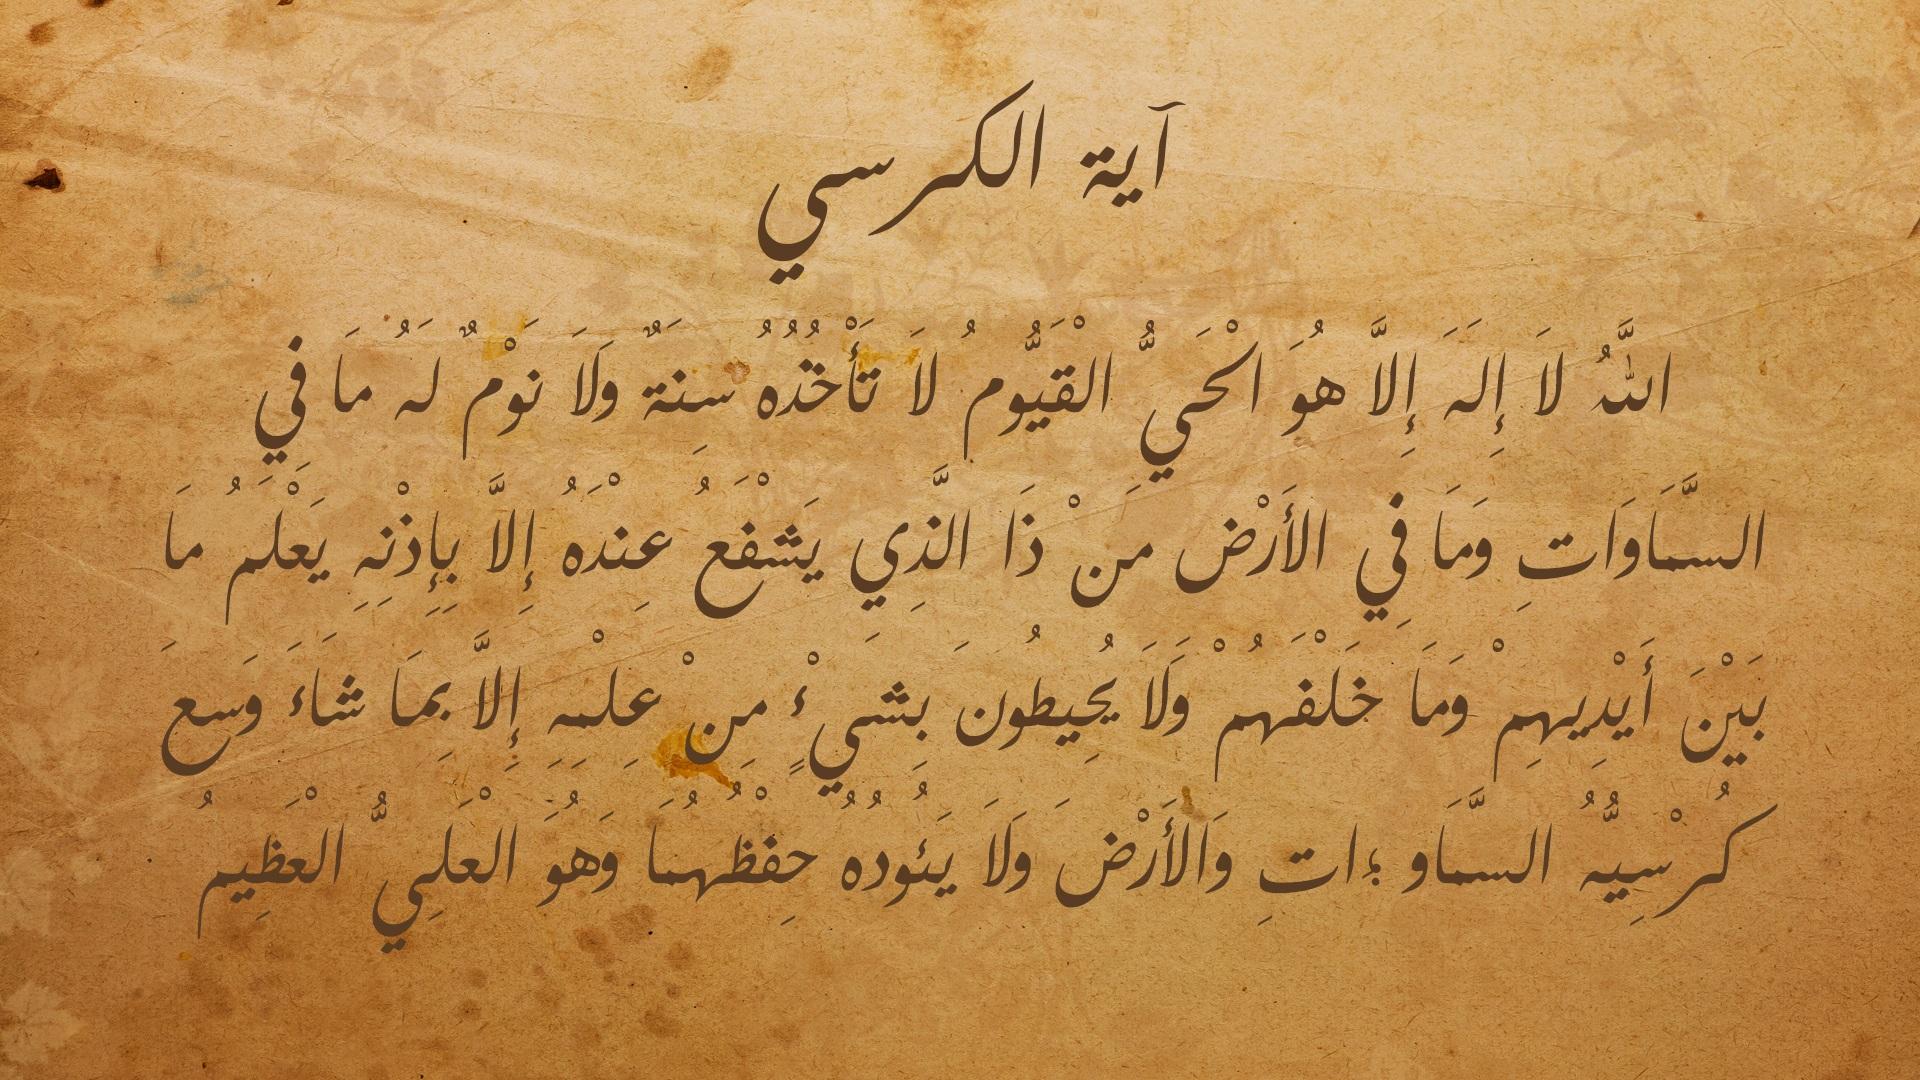 Área de Estudios Semíticos e Islámicos